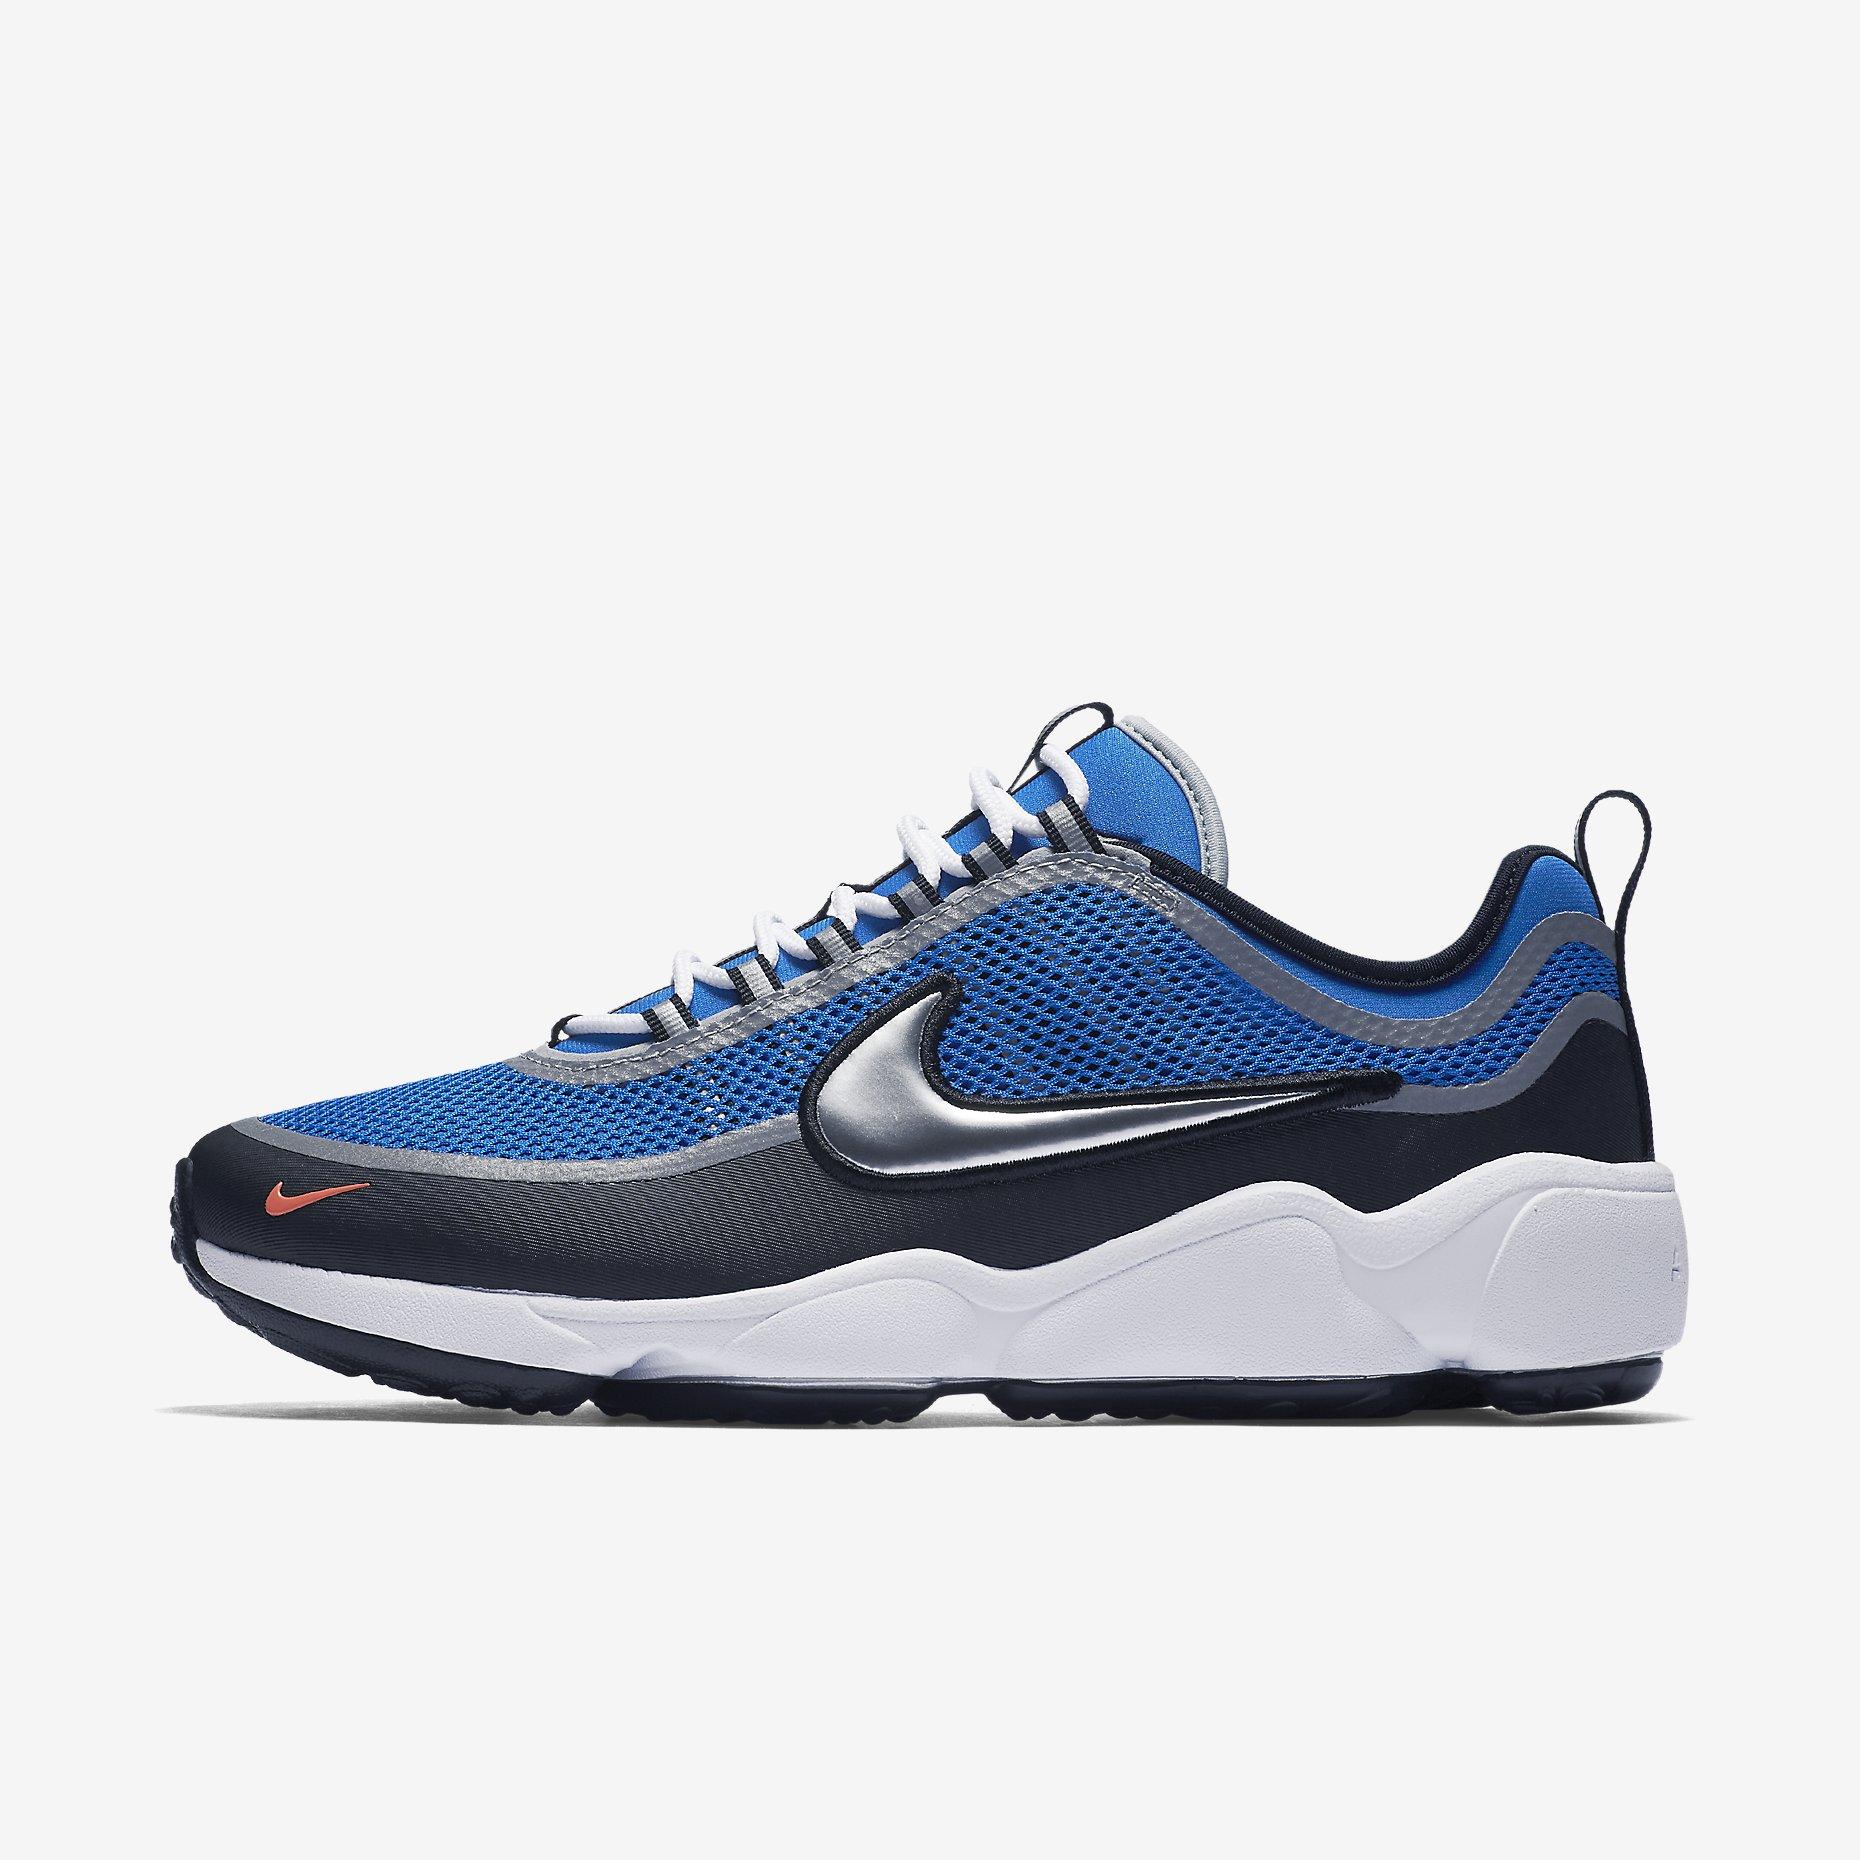 Nike Zoom Spiridon Ultra Regal Blue - Air 23